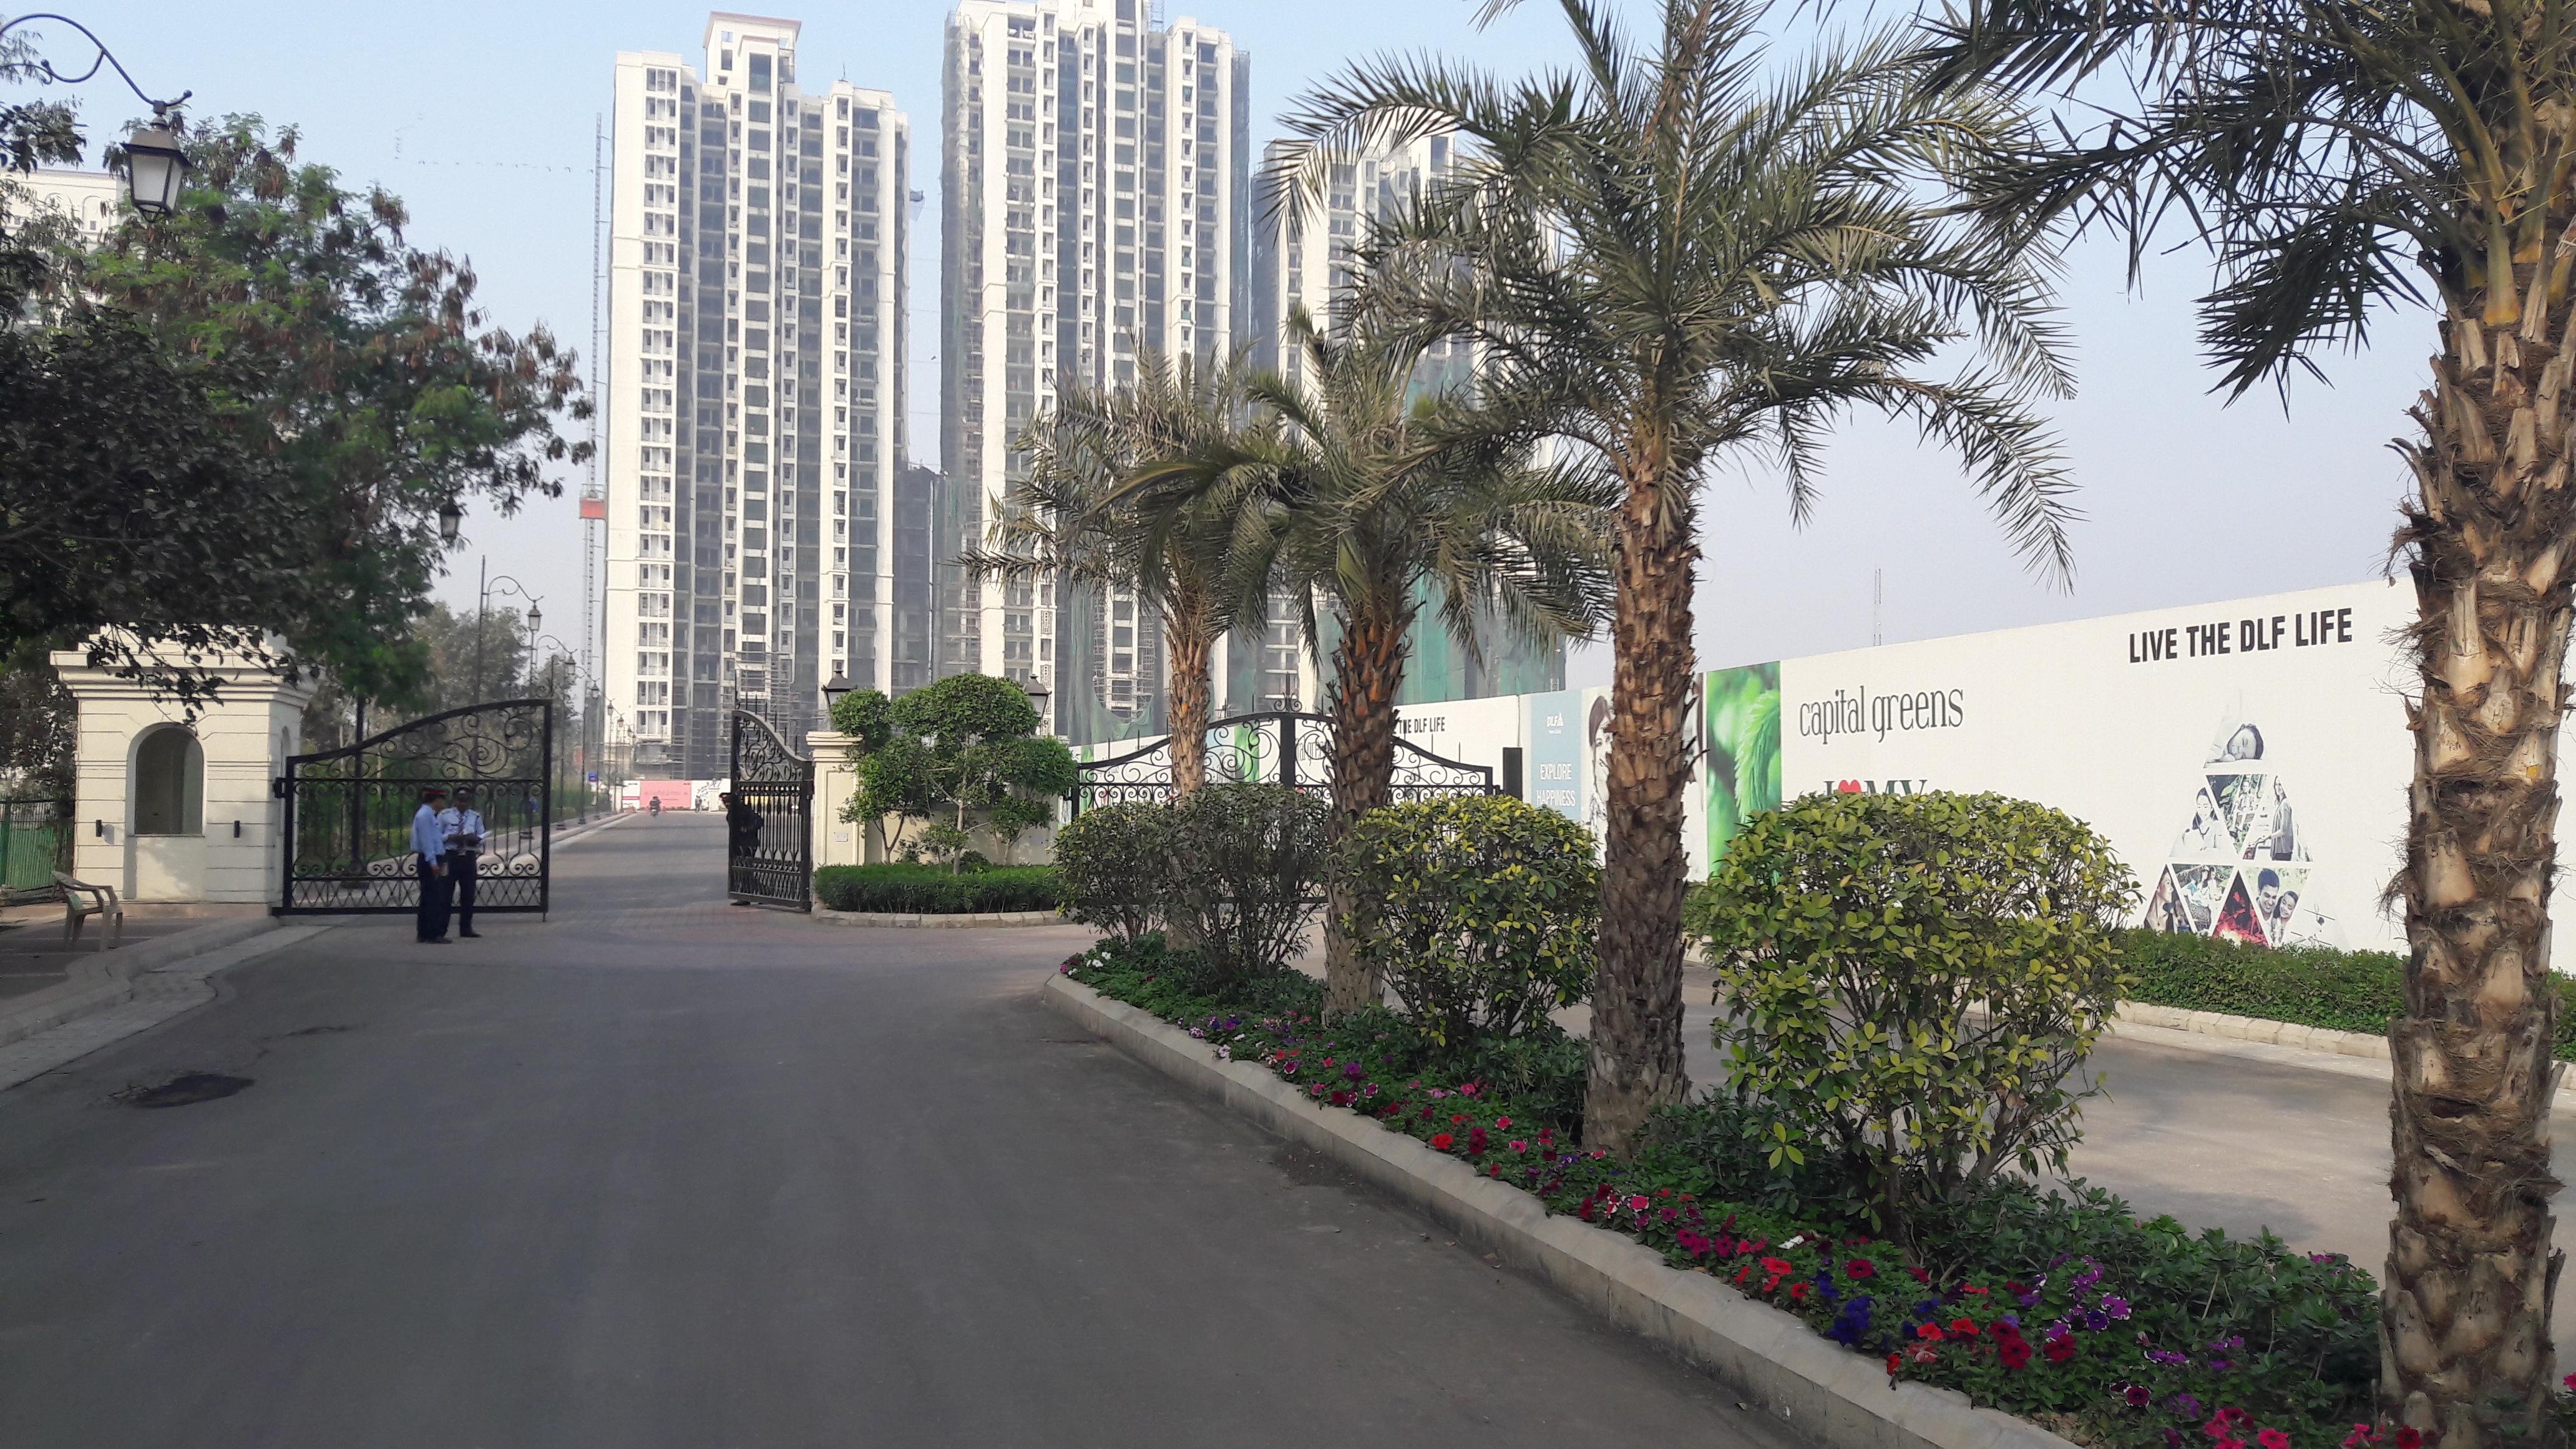 3 Bhk Apartment Flat For In Dlf Capital Greens Moti Nagar Delhi West 1415 Sq Ft To 1753